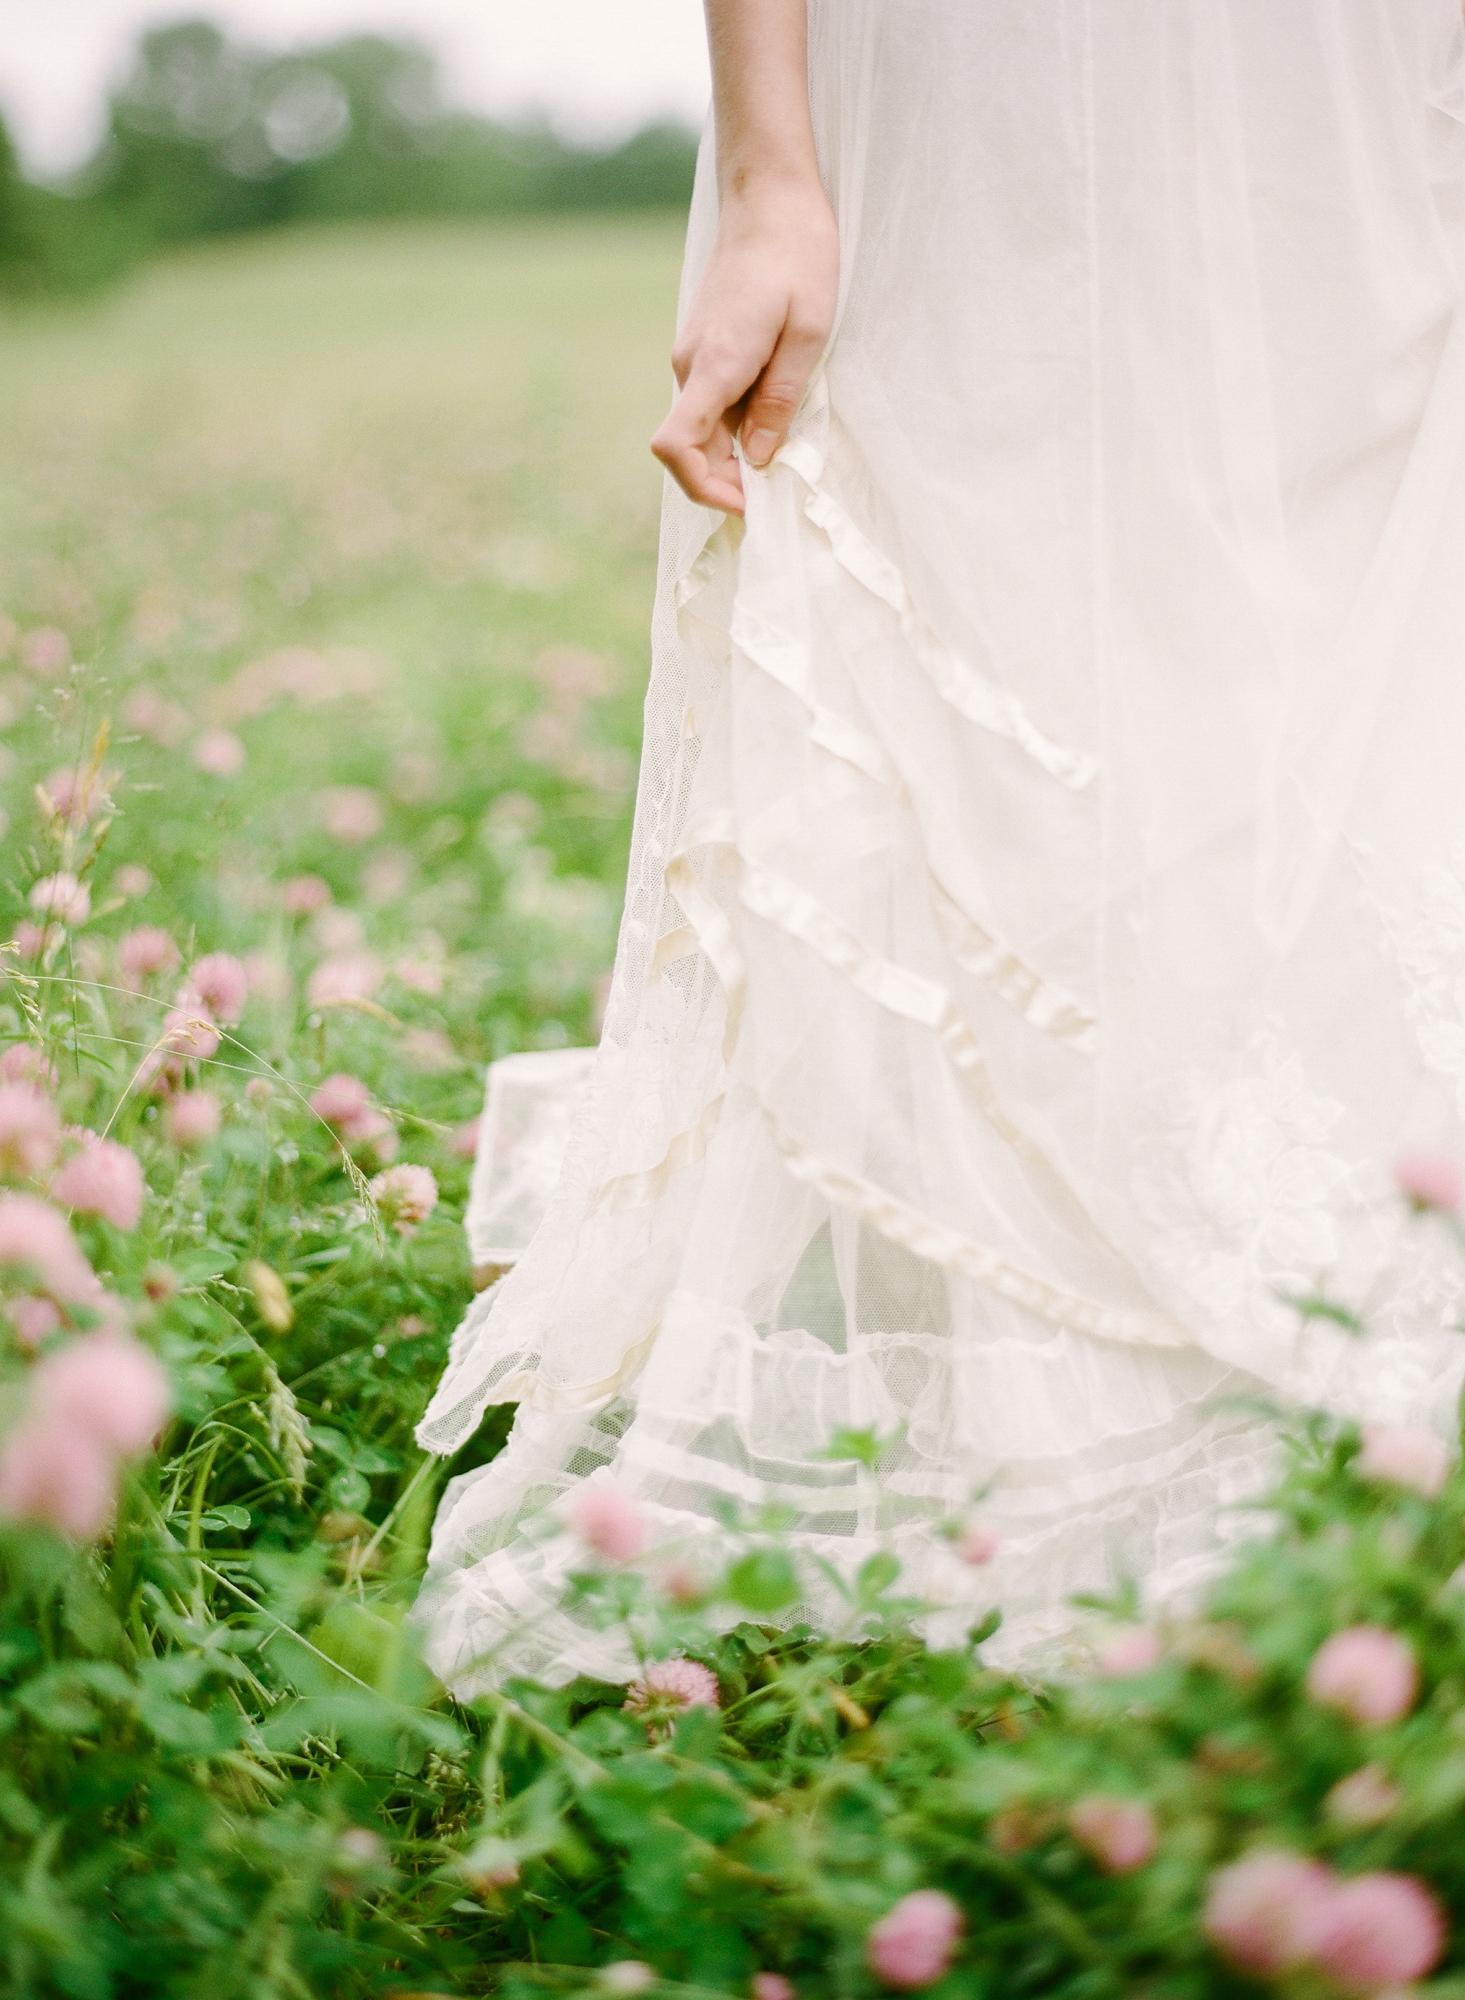 bride wearing petticoat standing in field of wildflowers